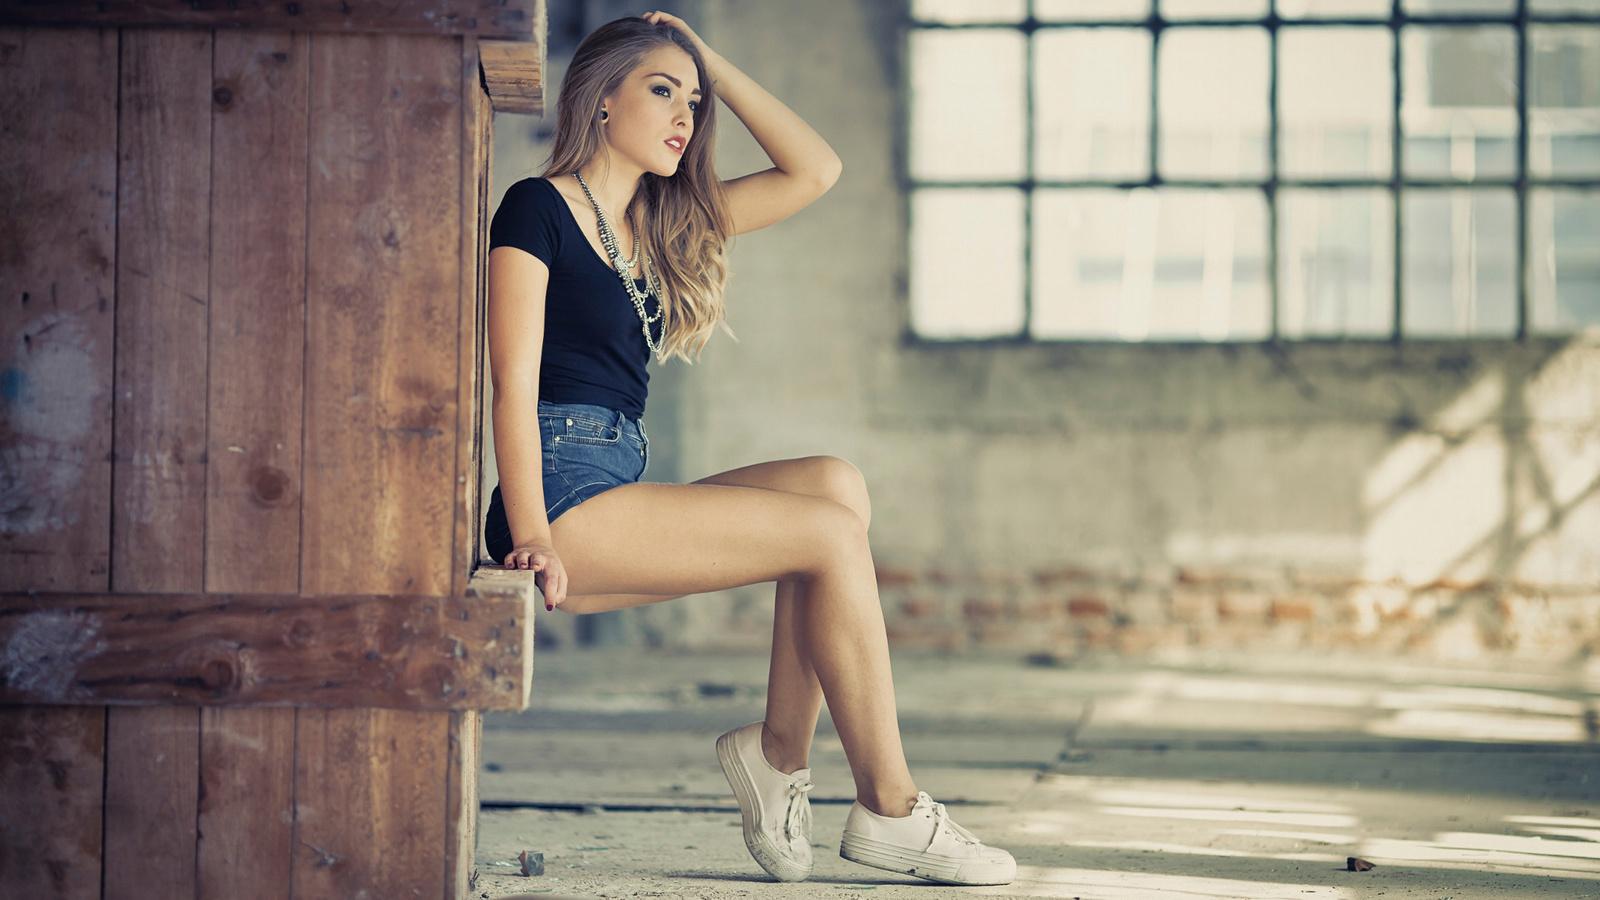 mariana, шорты, ножки, макияж, здание, окно